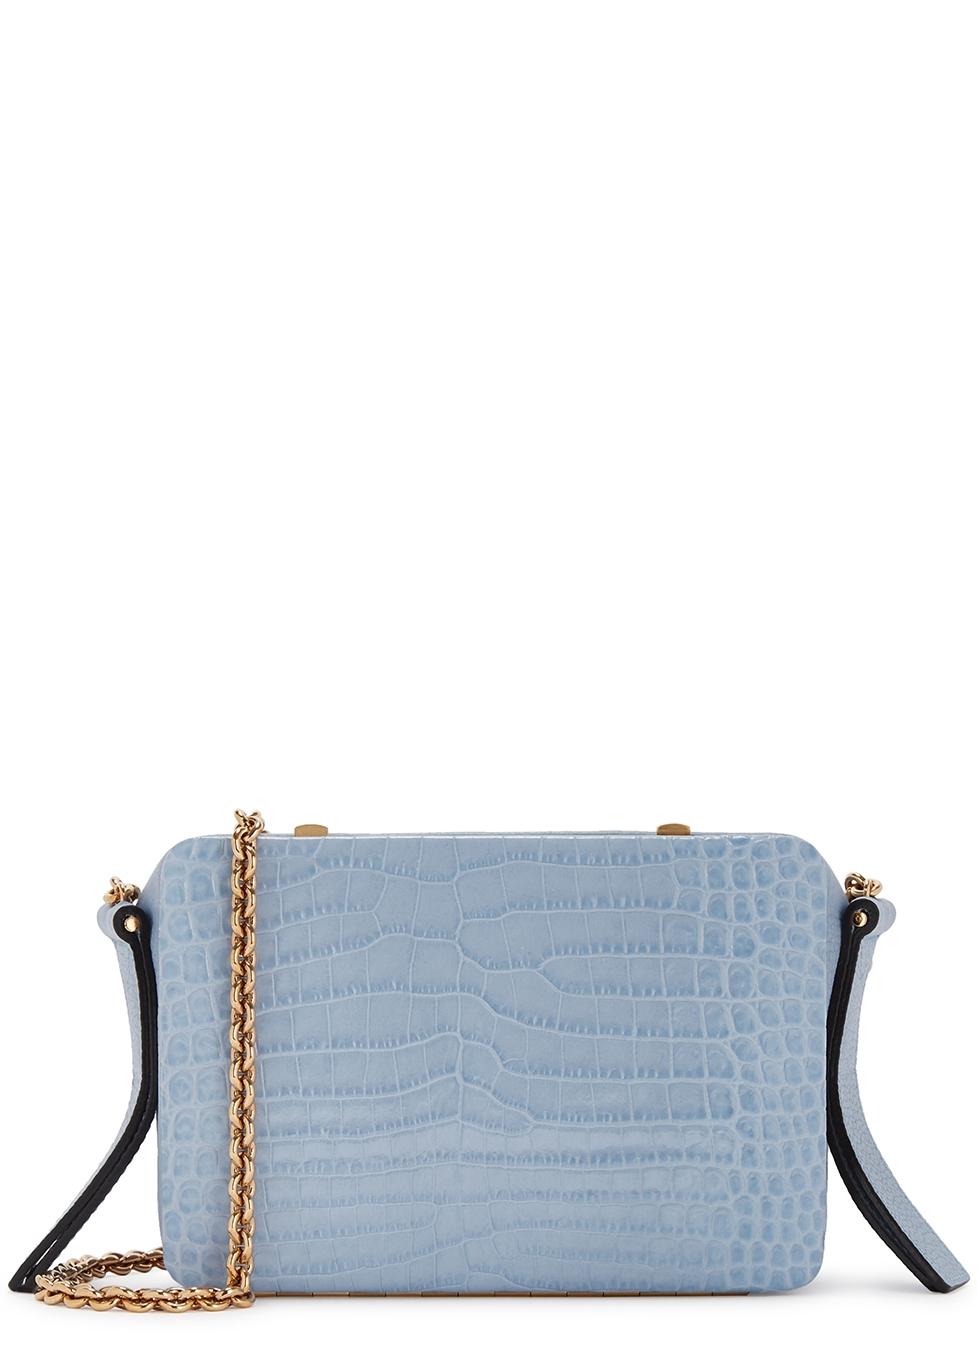 3498624d2526 Women s Designer Bags